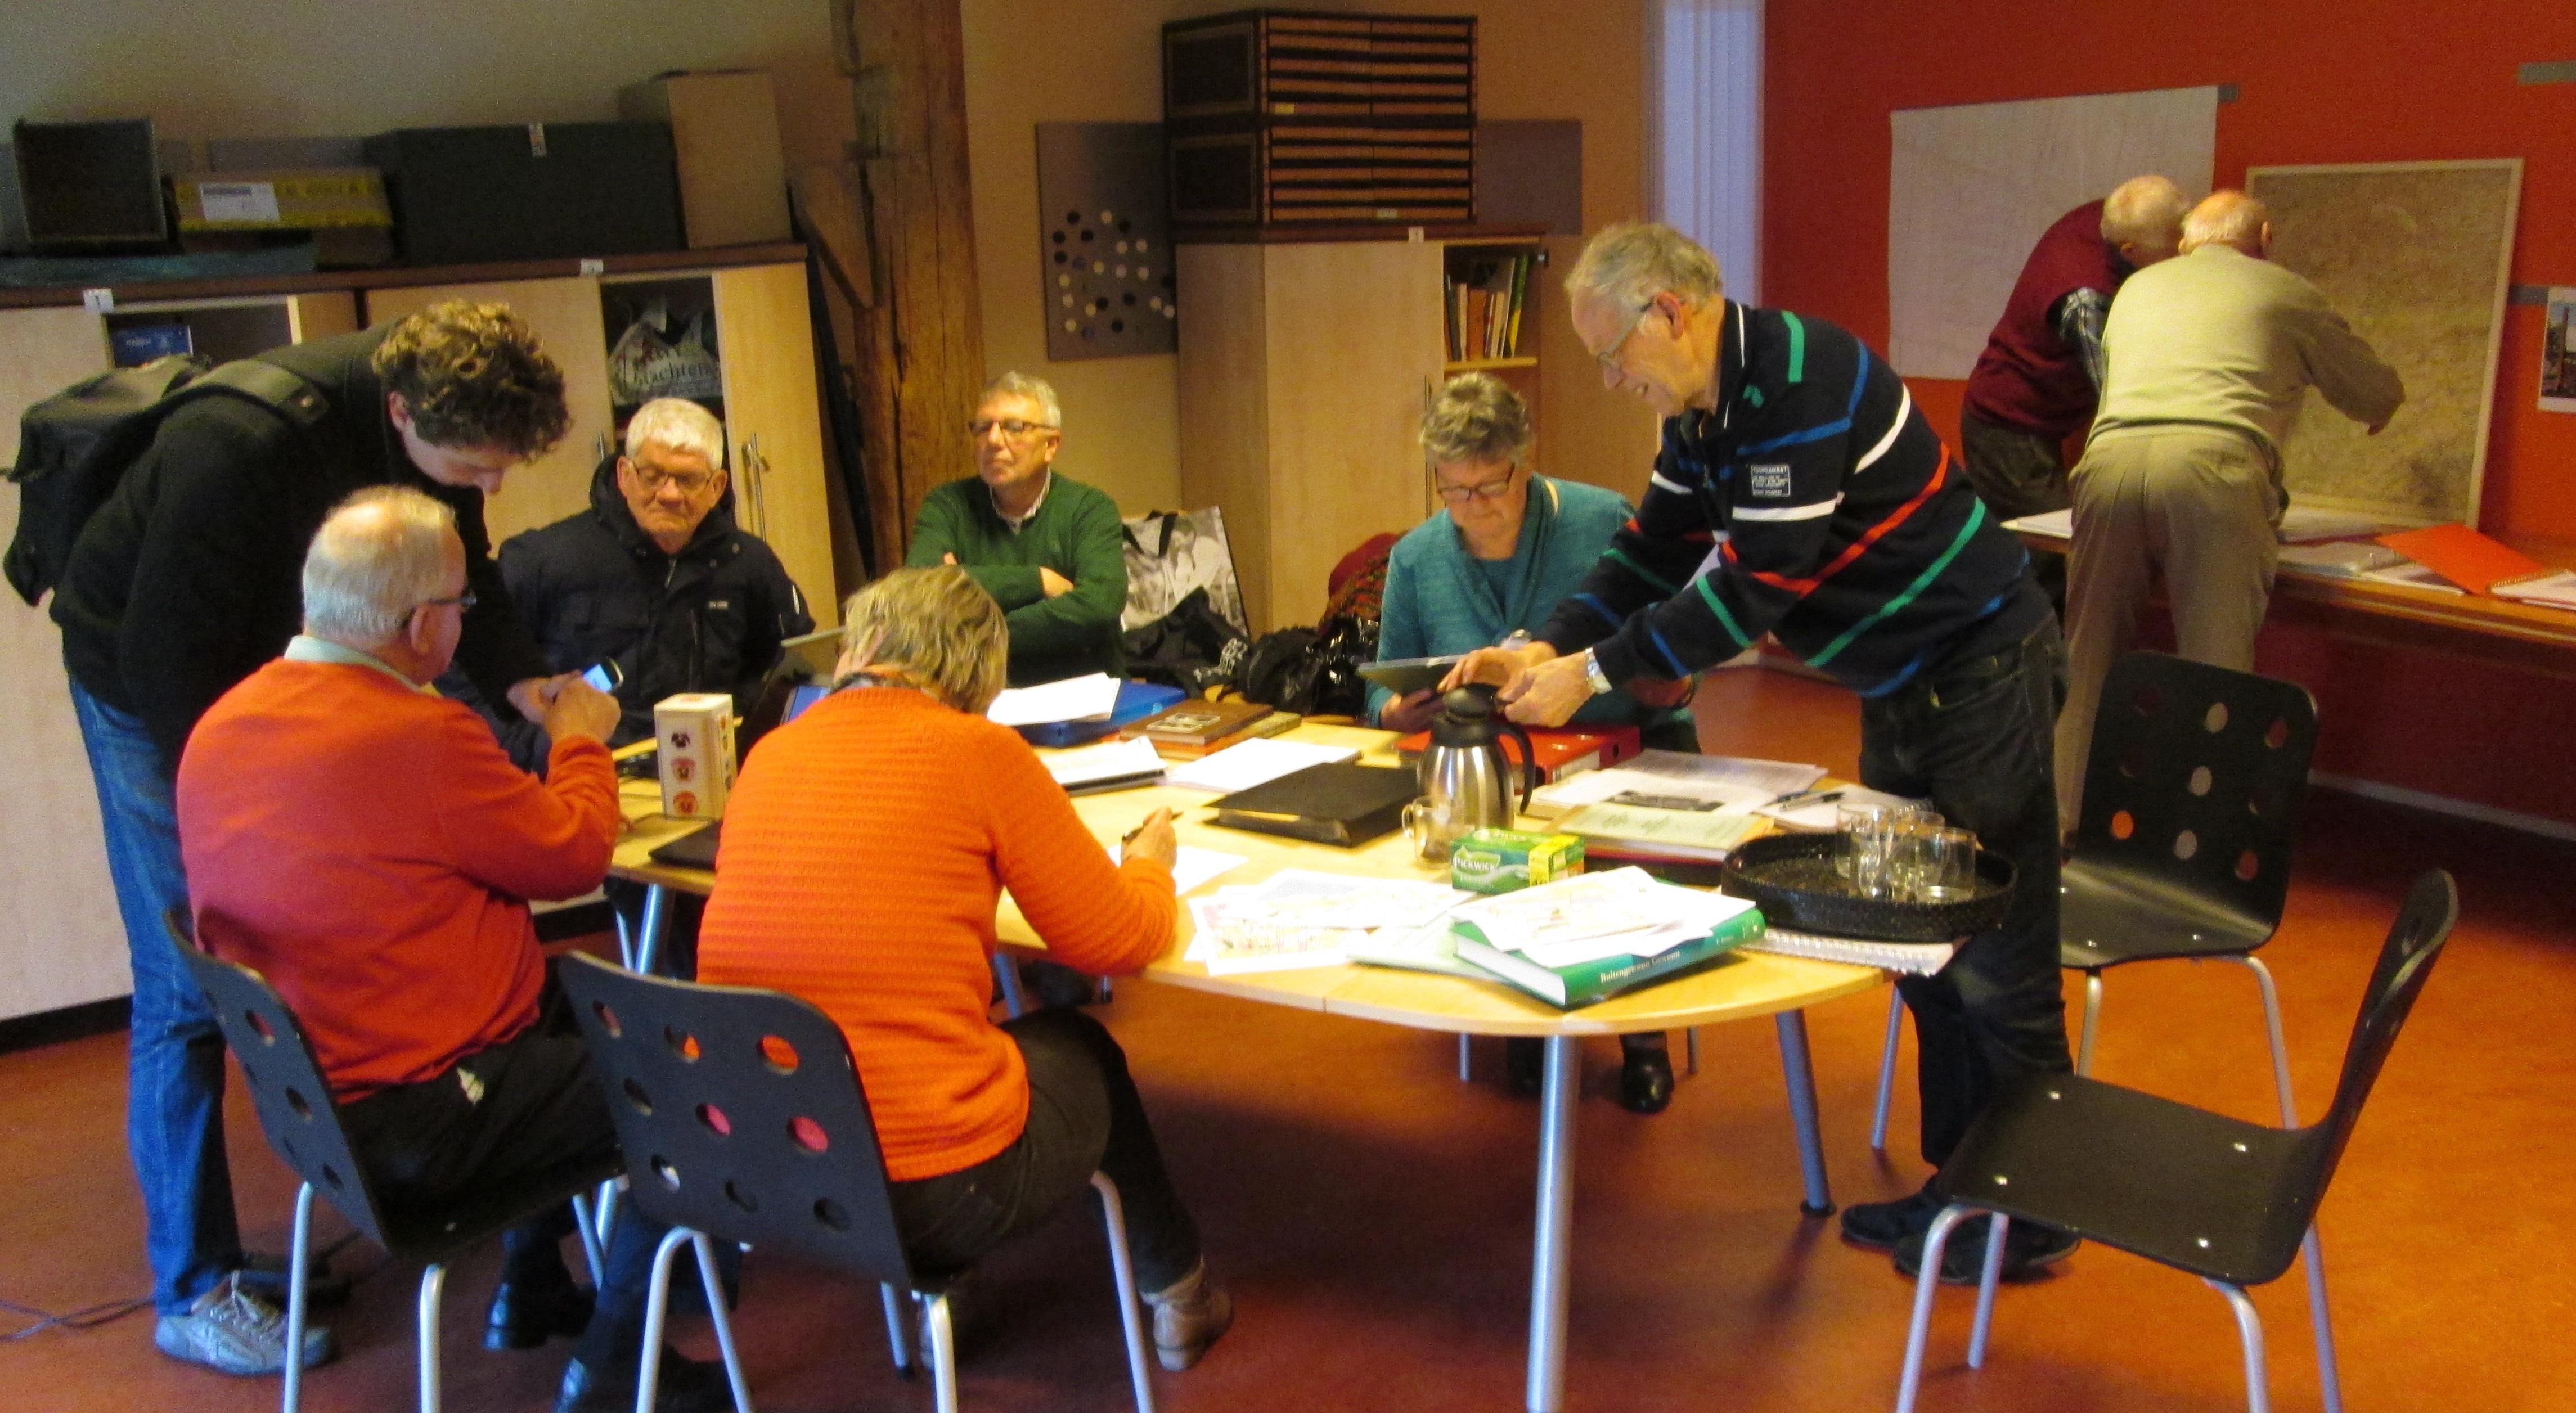 Impressie van de inloopmiddag op 'It Einenêst' (foto: Sjouke van der Heide).